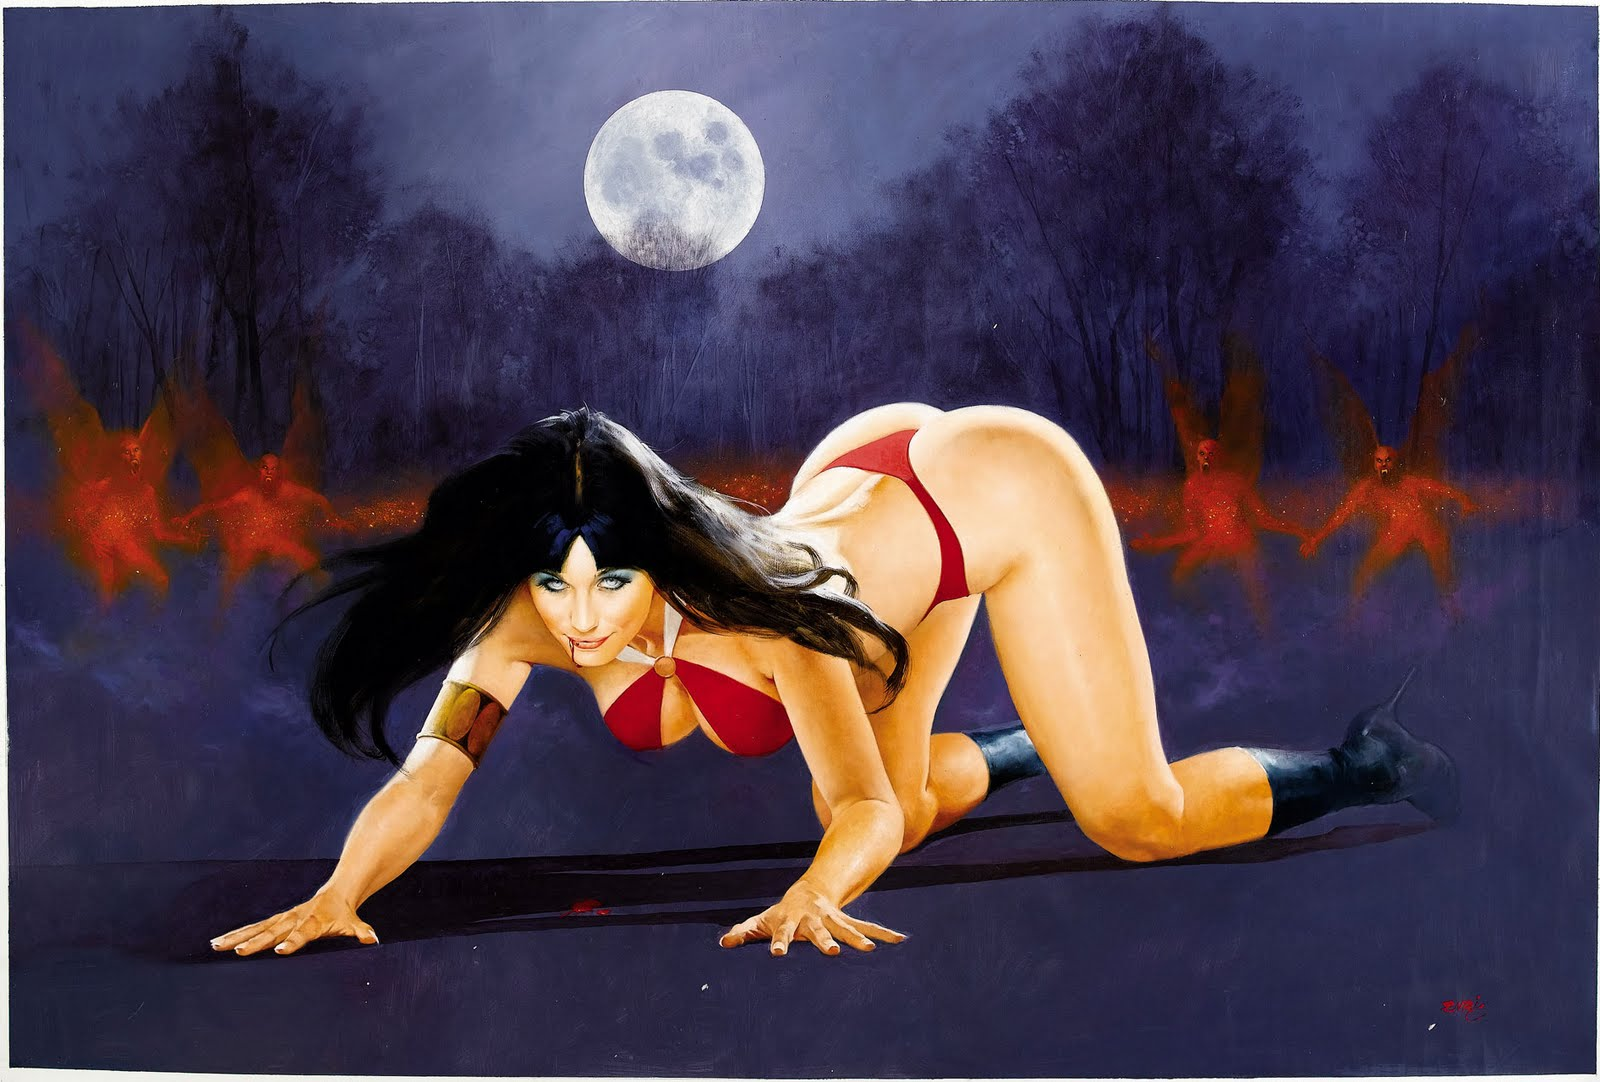 http://4.bp.blogspot.com/-HLM7ZJqe5XE/Tkz-c8_WgNI/AAAAAAAAH-M/6it-v-MLENo/s1600/vampirella_wallpapers_fondos_03.jpg